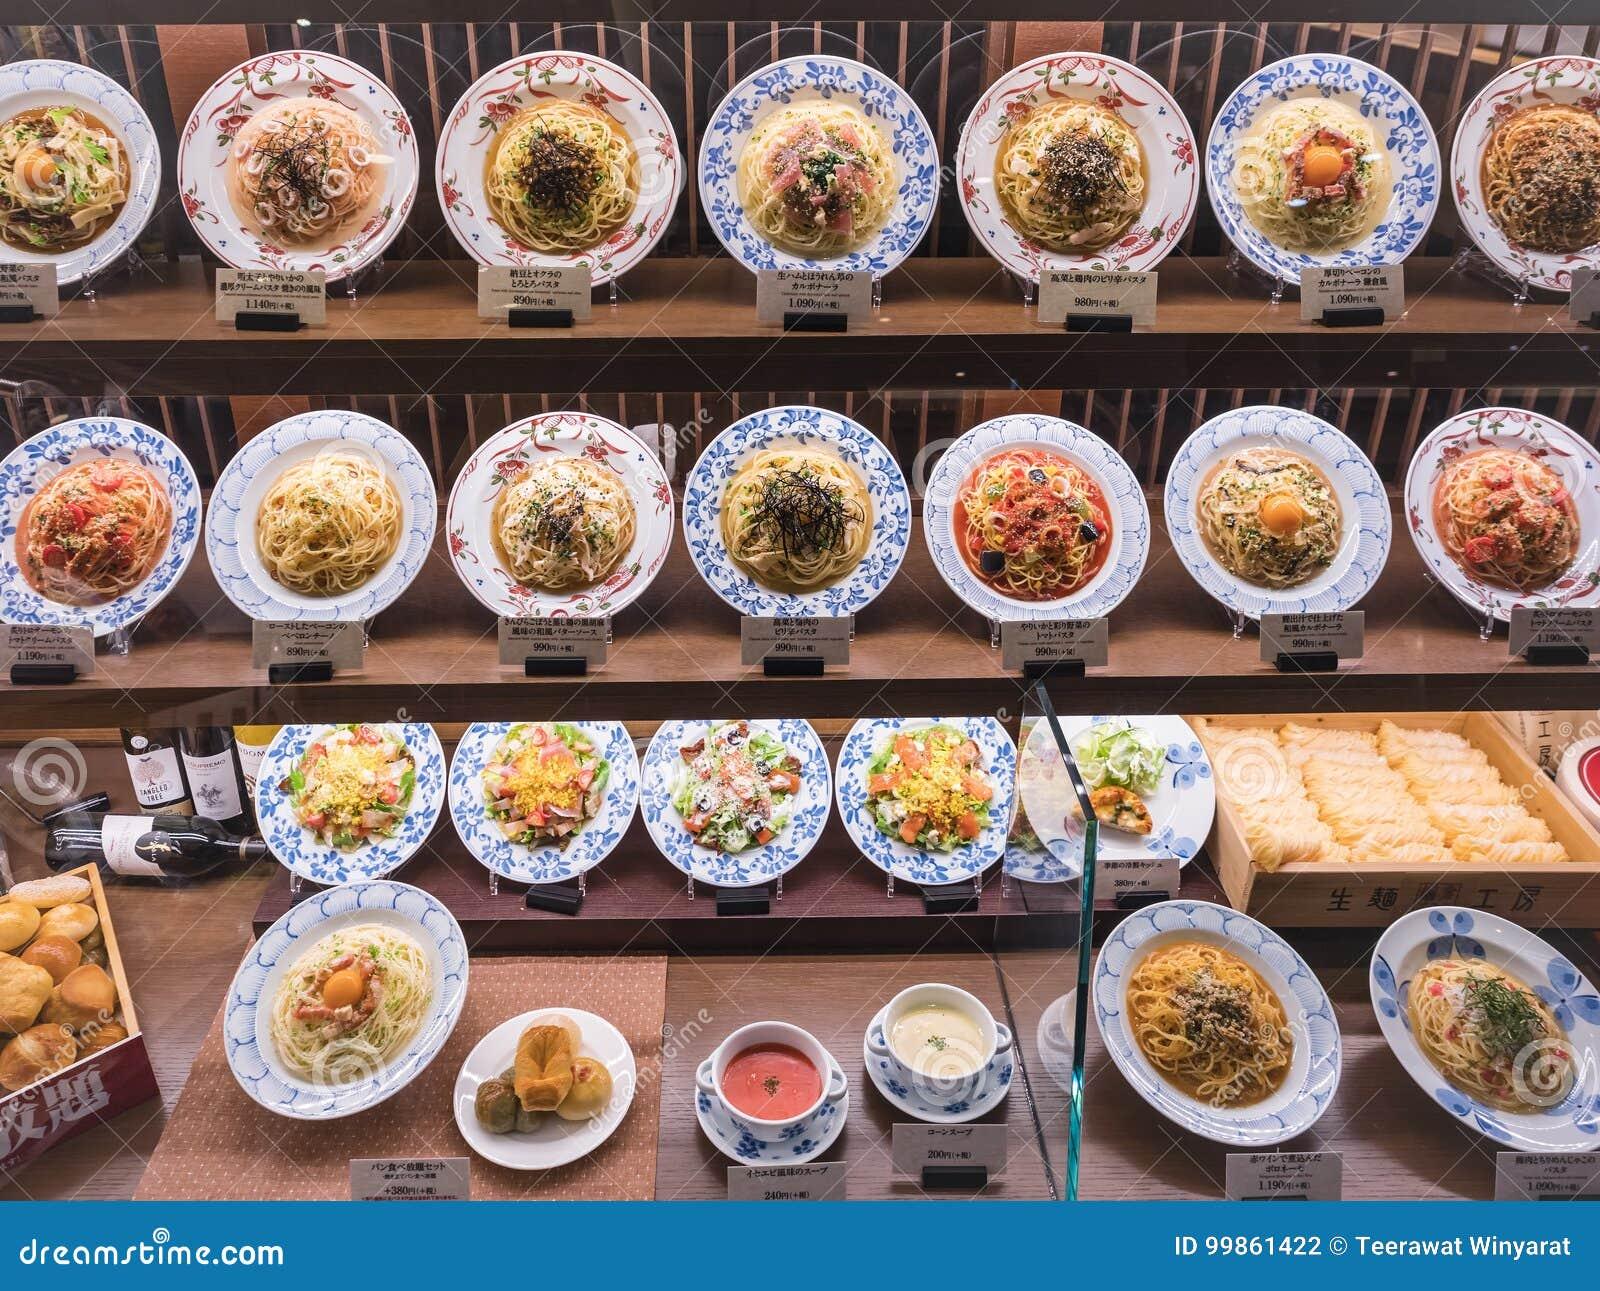 Japan Food Display spaghetti plates Italian Japanese fusion Restaurant